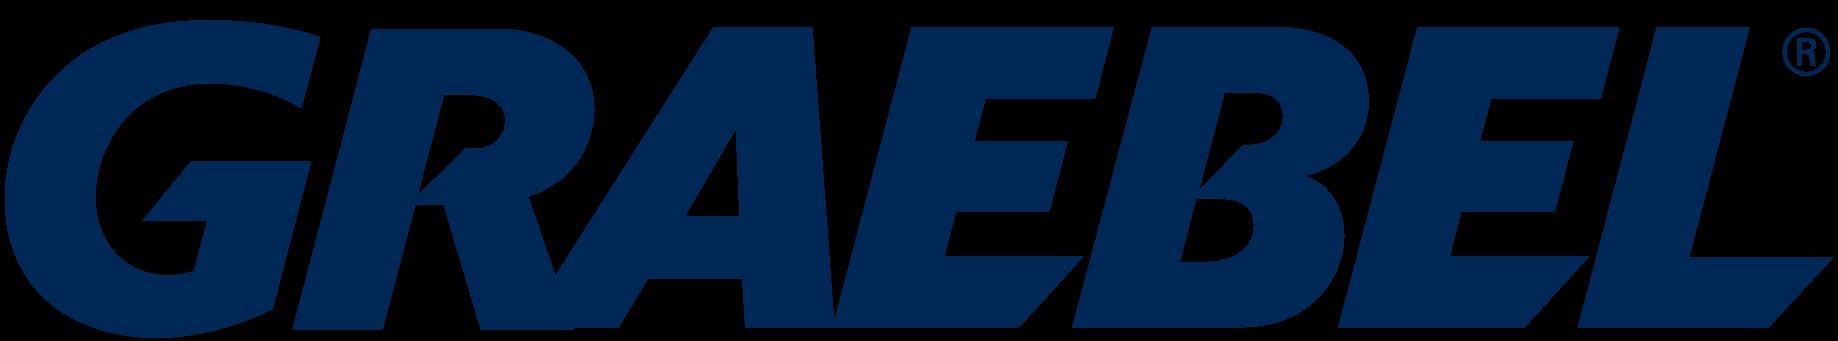 Graebel logo